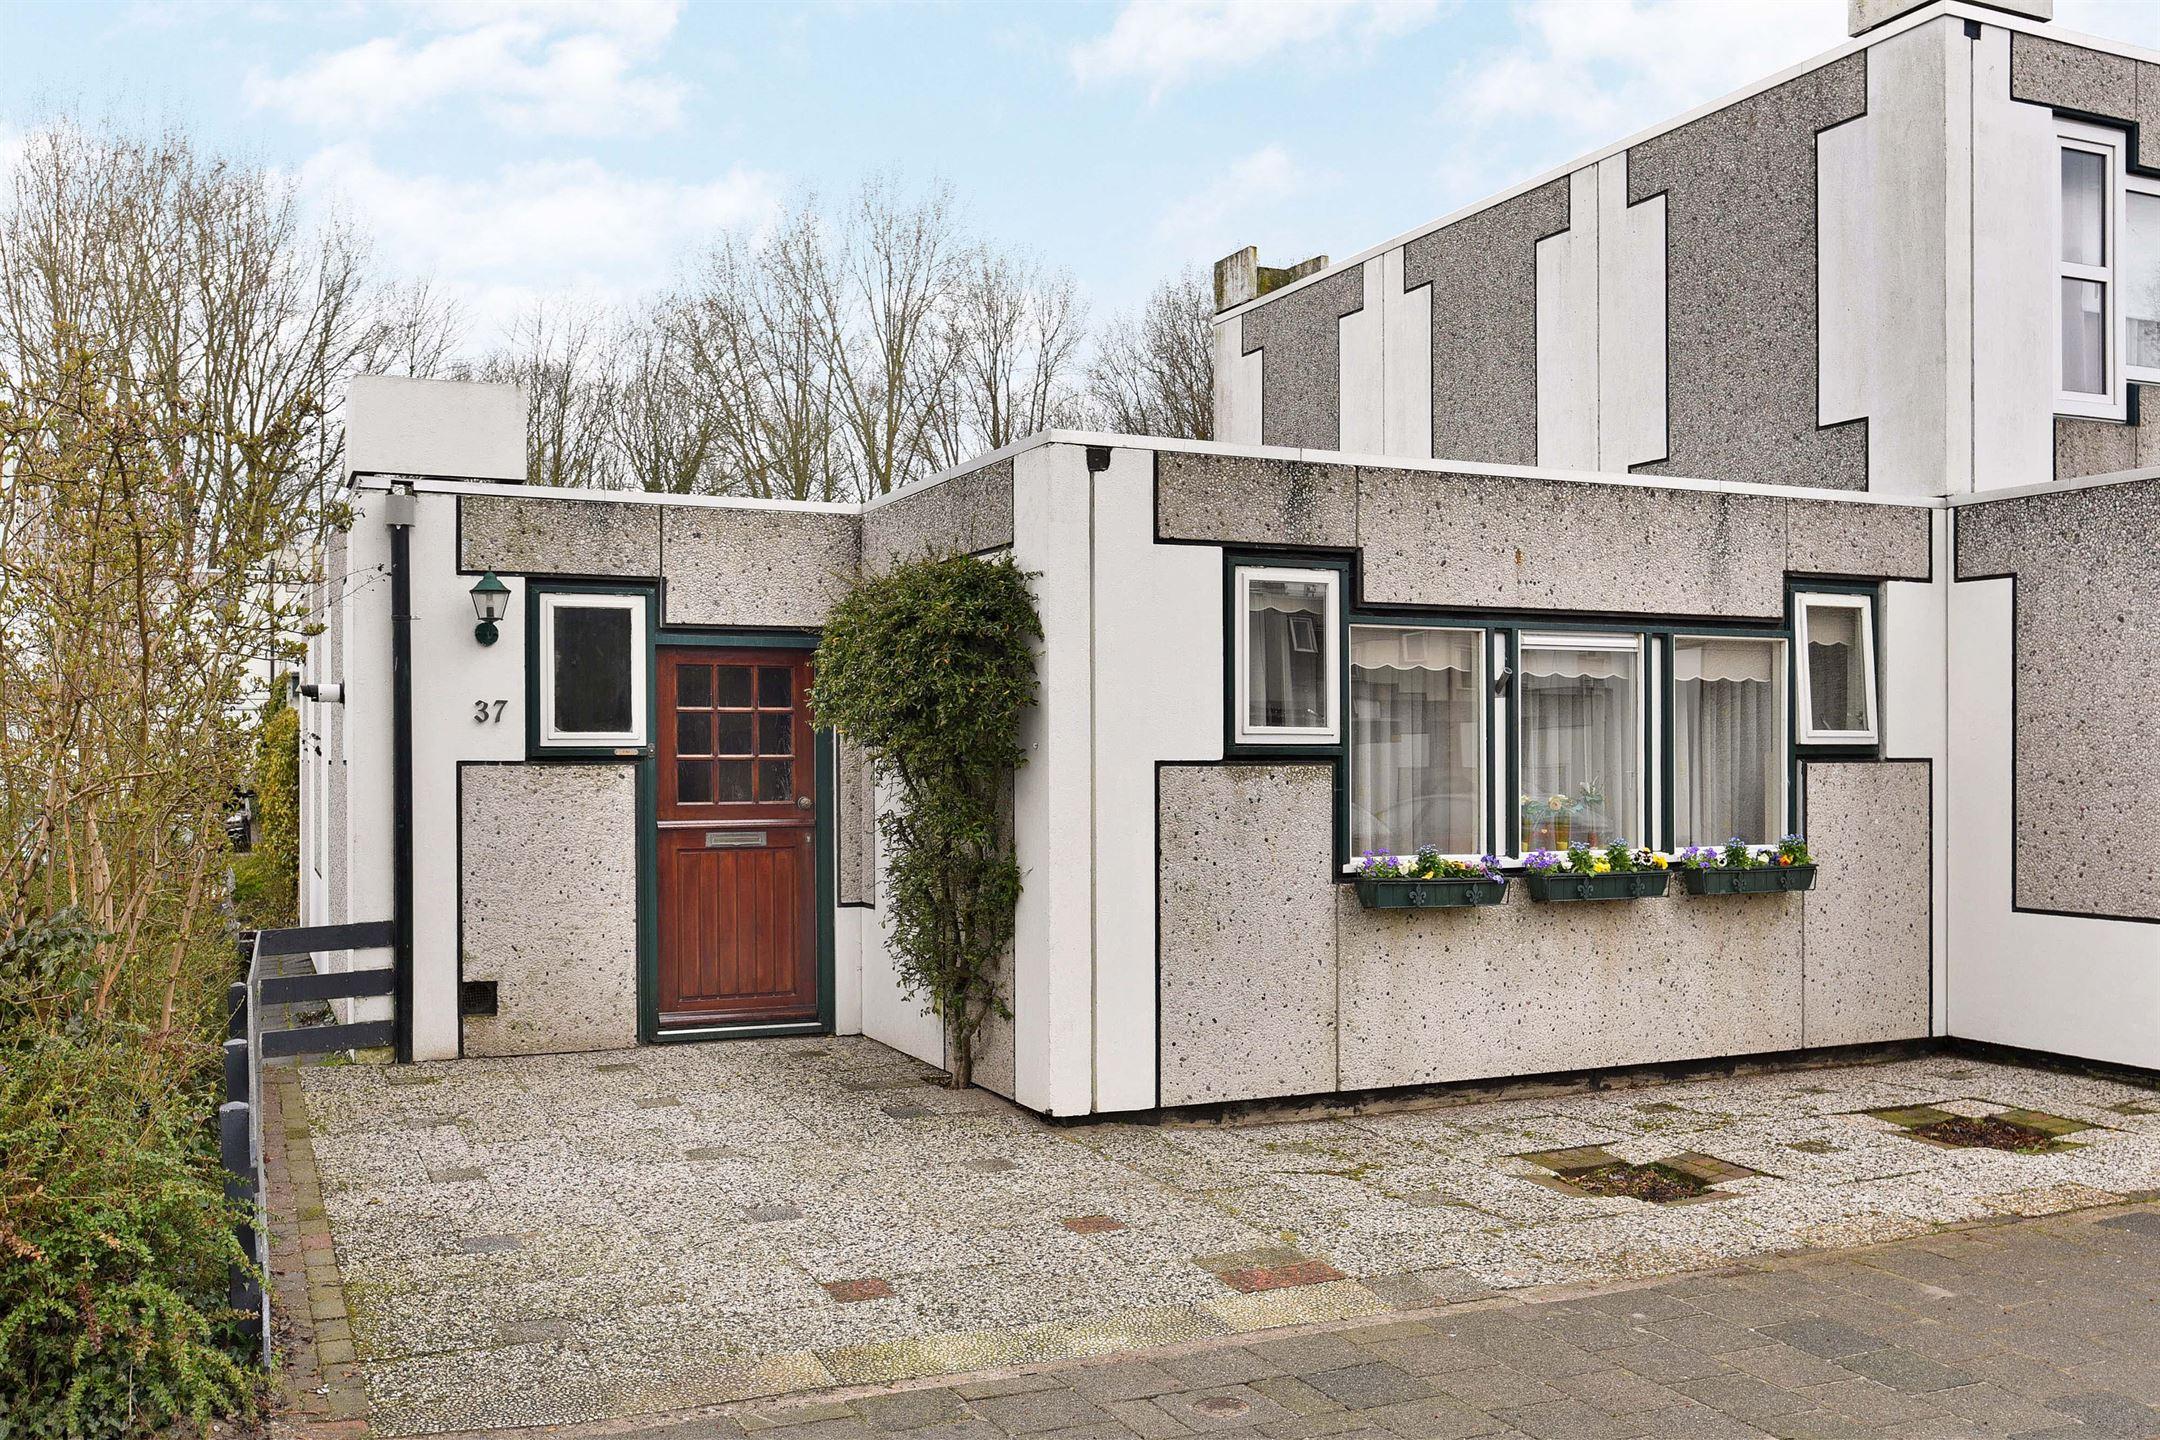 Verkocht: Loevestein 37 3328 JH Dordrecht [funda]